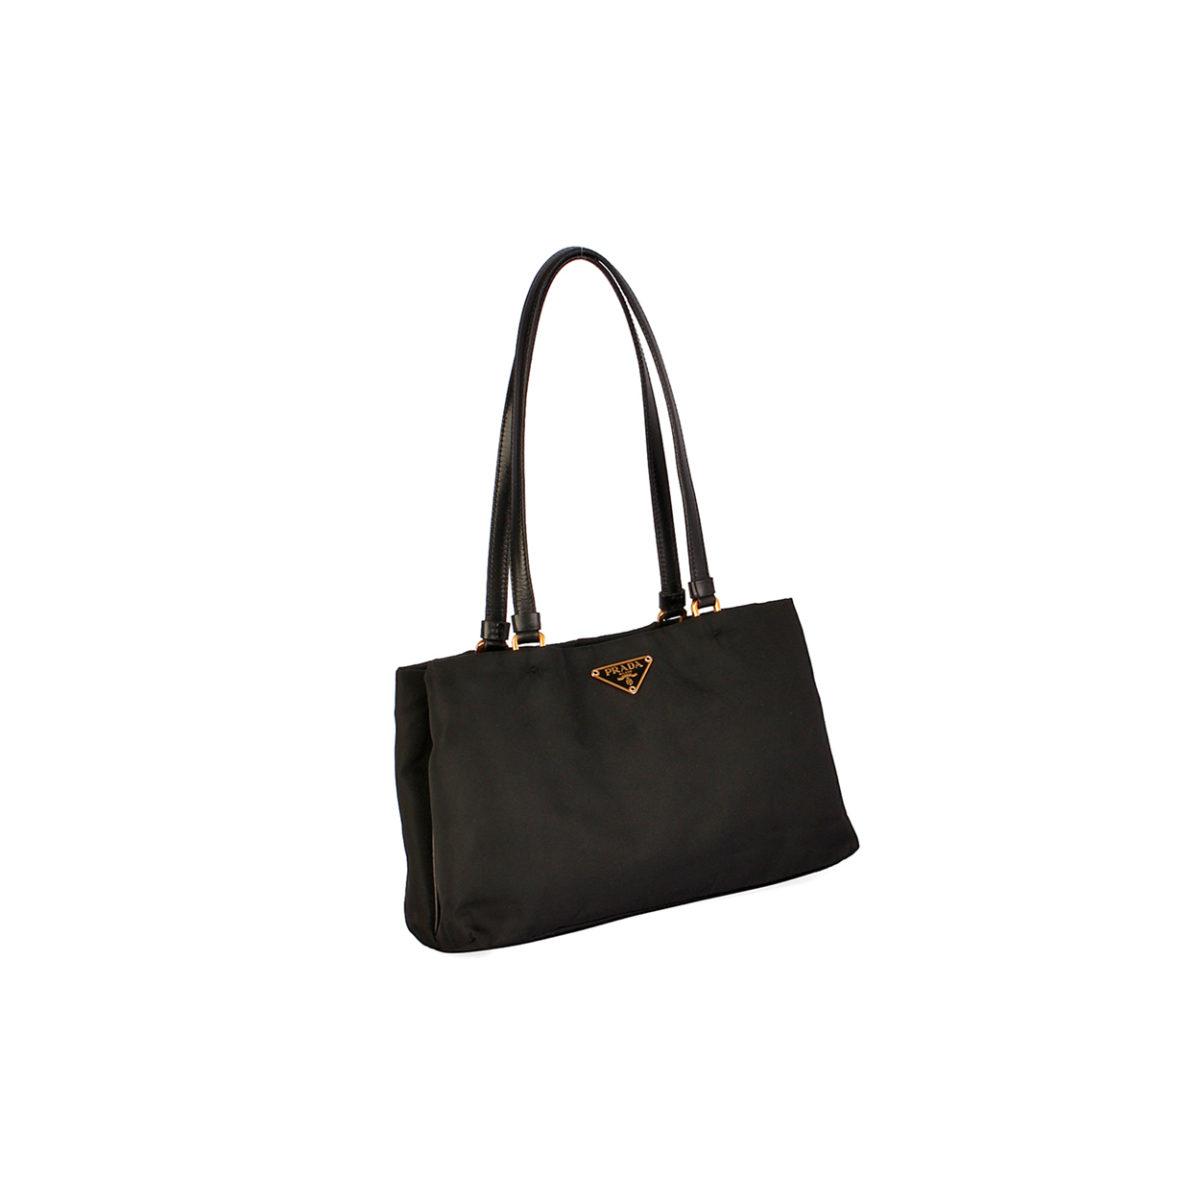 6caf1450ee14 PRADA Tessuto Sport Nylon Bag Black | Luxity